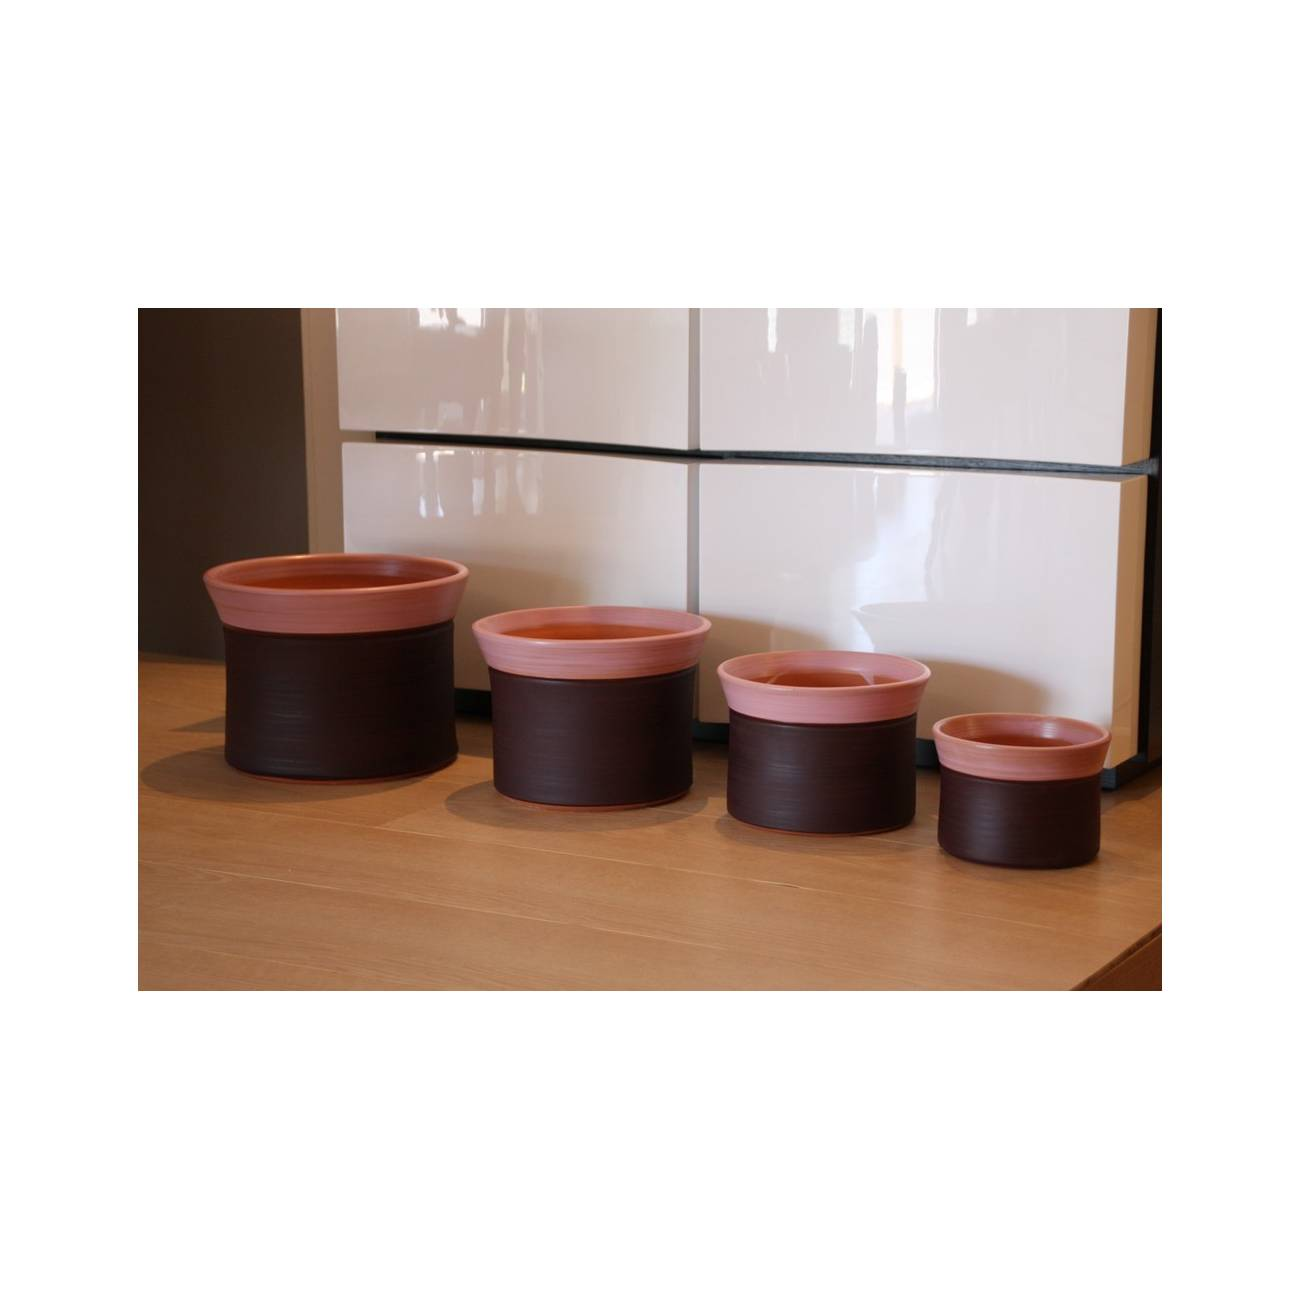 more terre de rose poterie rose les poteries d 39 albi. Black Bedroom Furniture Sets. Home Design Ideas